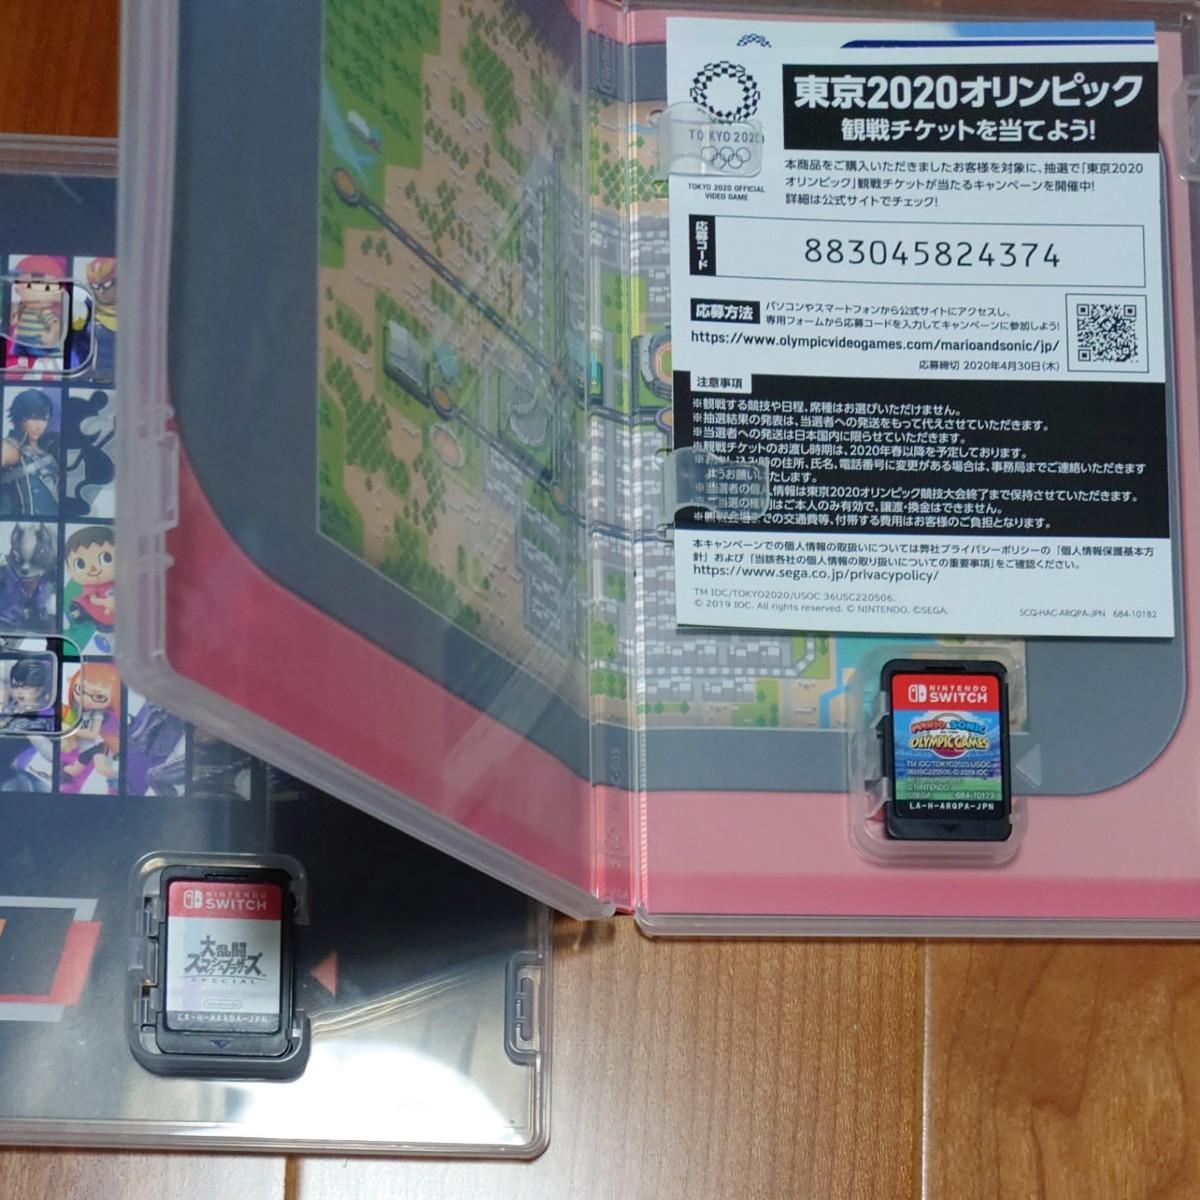 Nintendo Switch 大乱闘スマッシュブラザーズSPECIAL マリオ&ソニックAT東京2020オリンピック セット